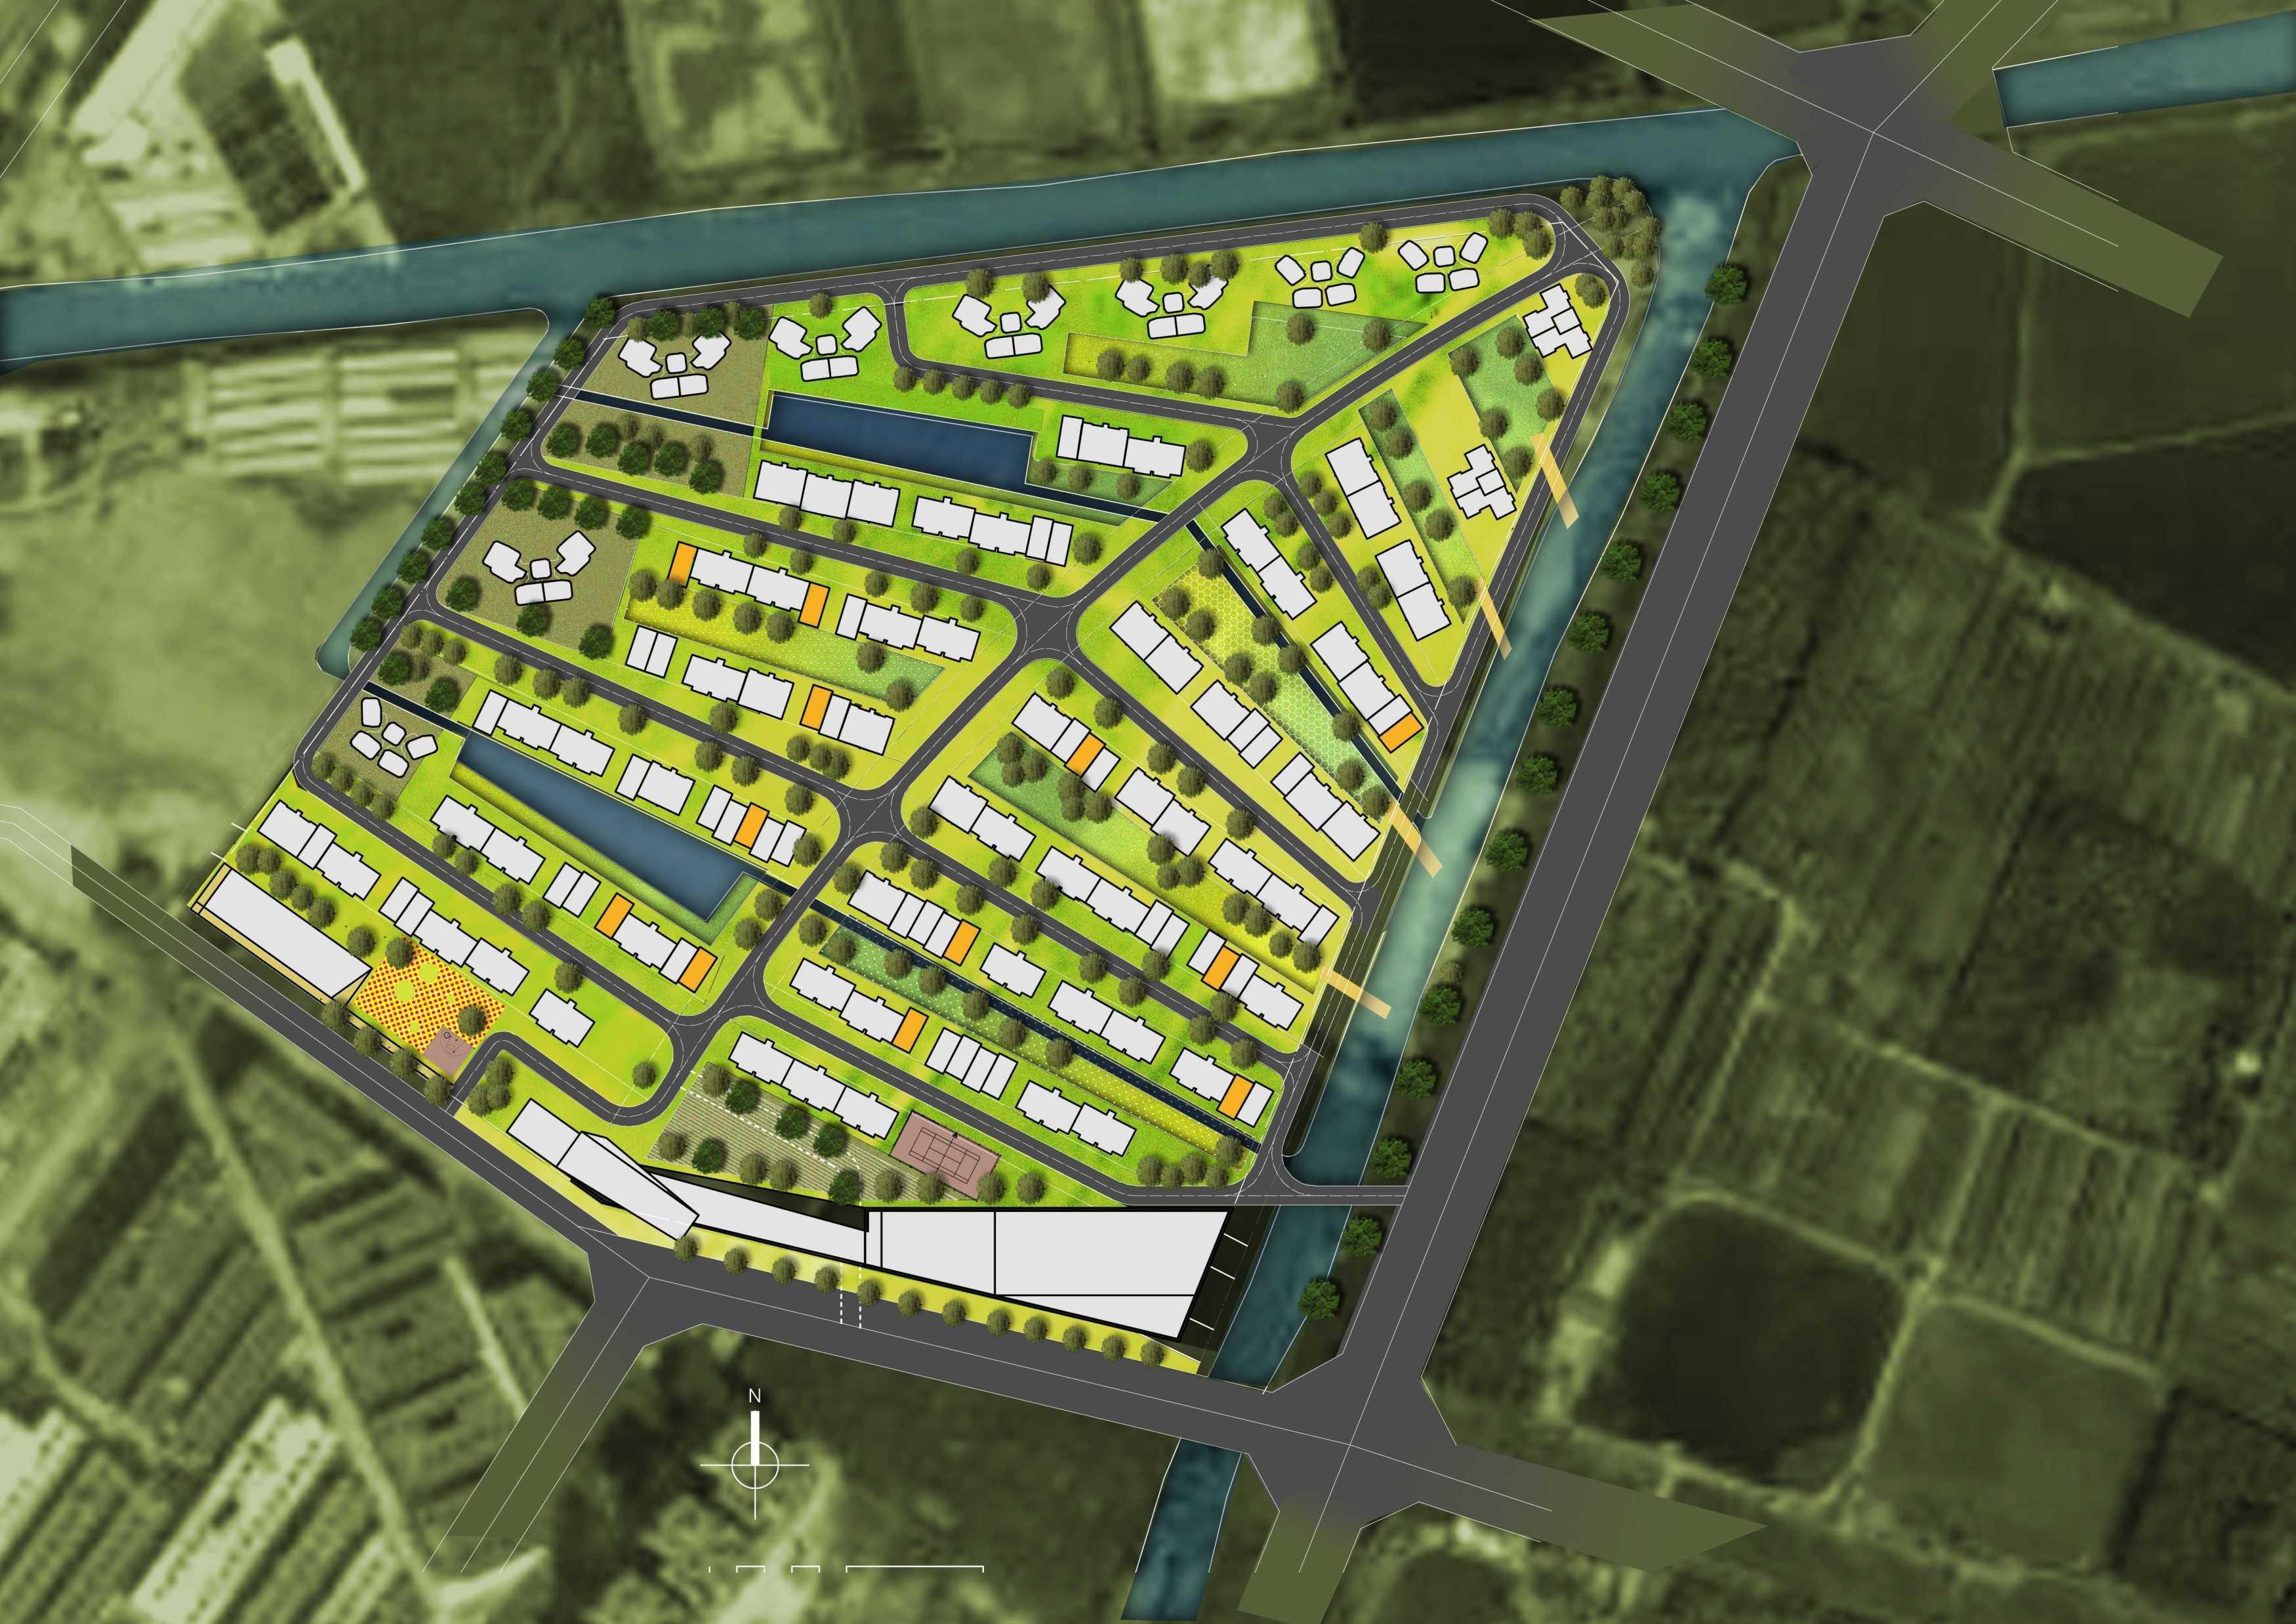 Tau Architect Zhuhai Residential Development Zhuhai,china Zhuhai,china P-Masterplan-Colour Kontemporer  13871